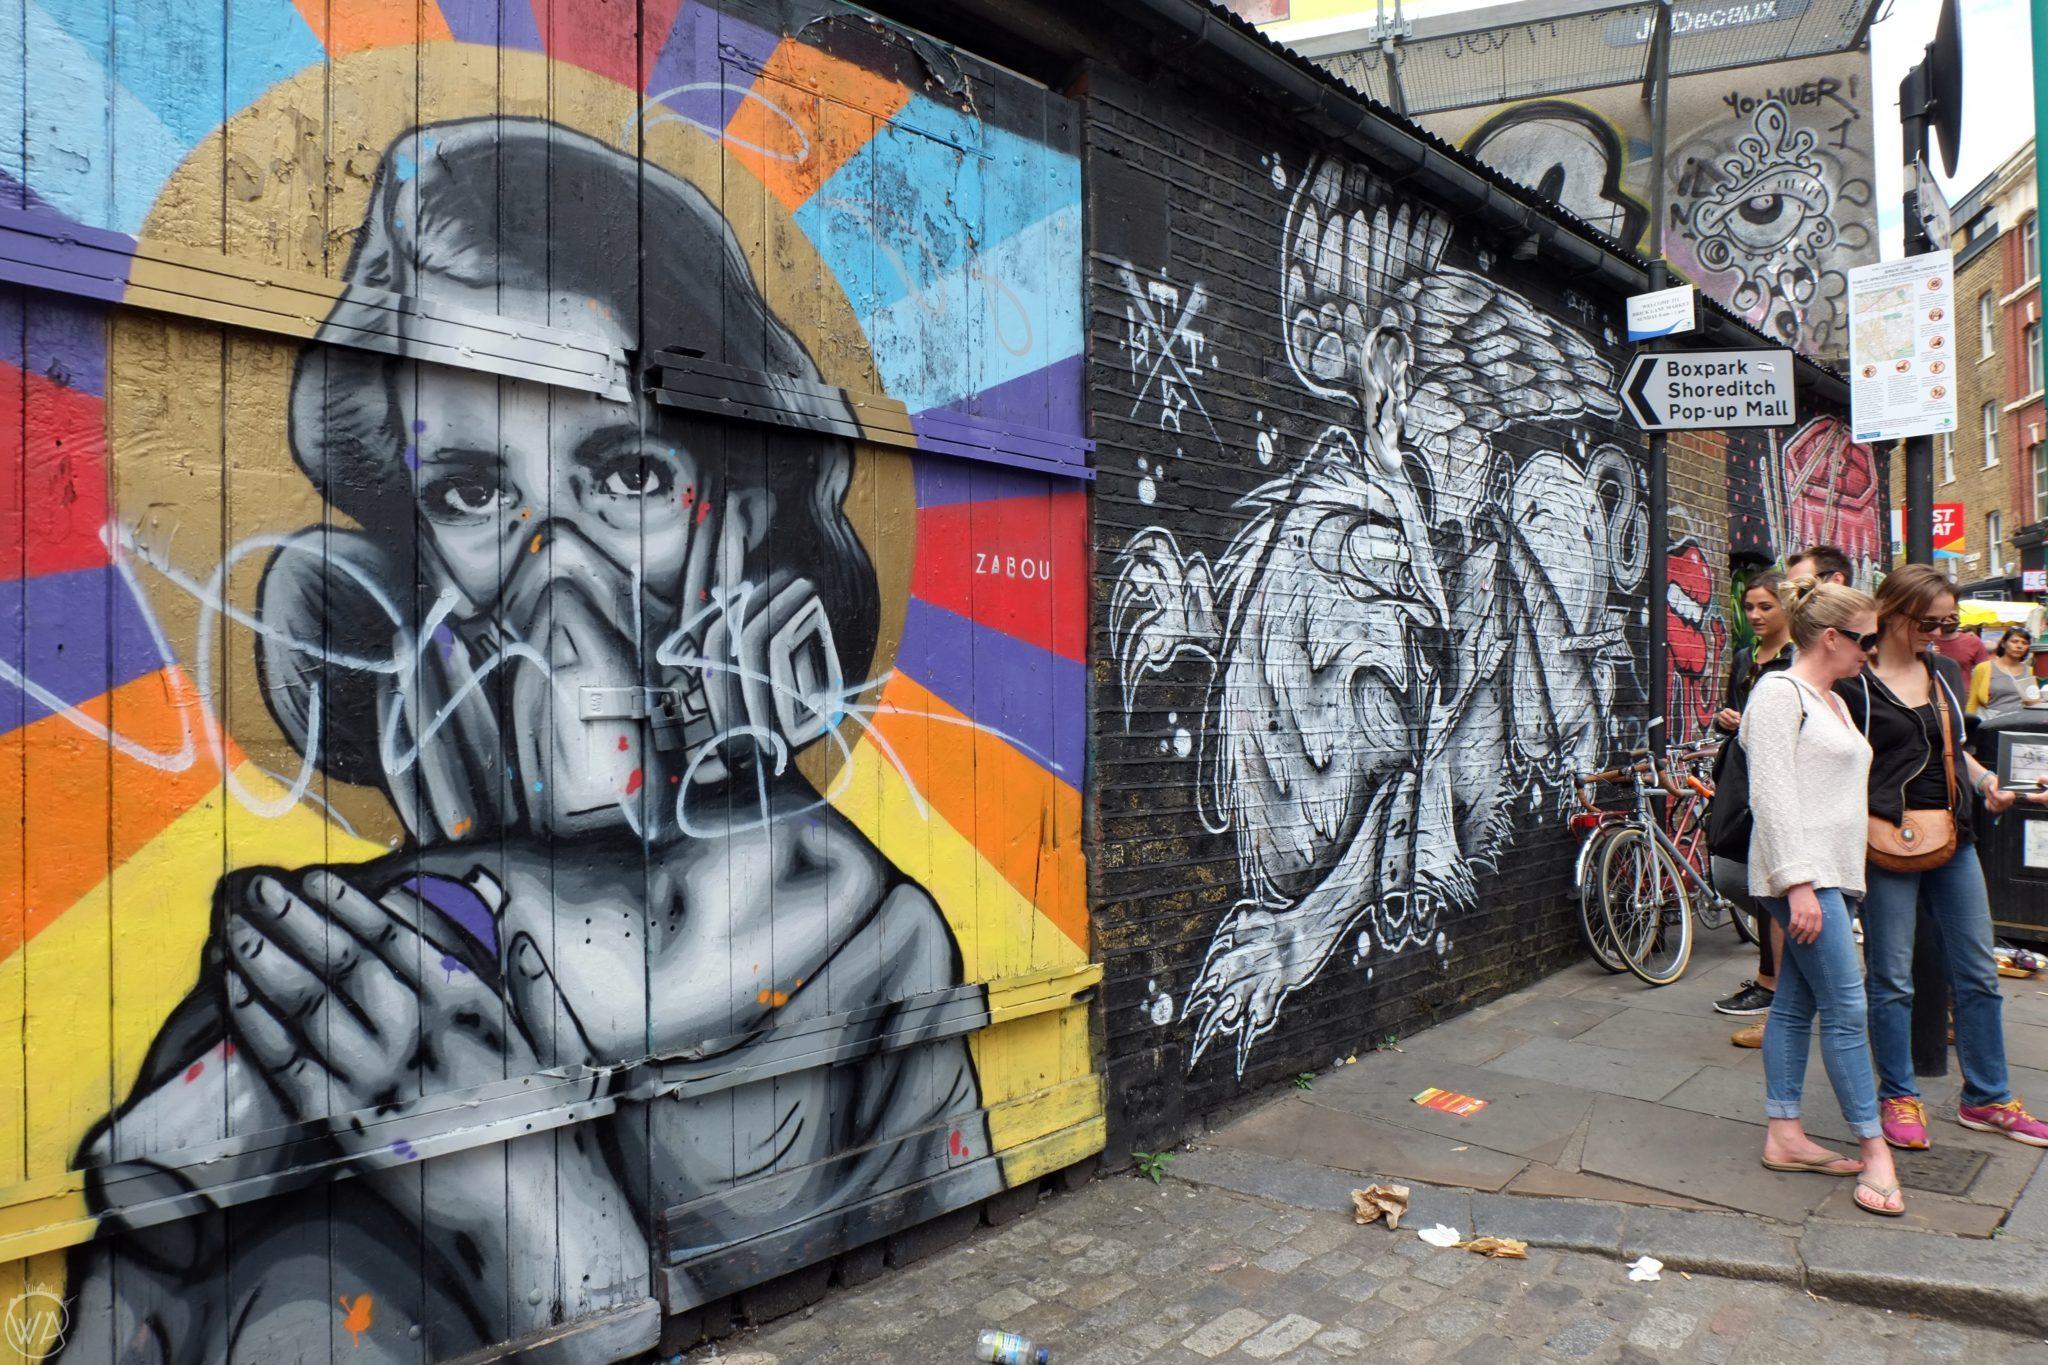 Street art of a girl, Brick Lane, East End London